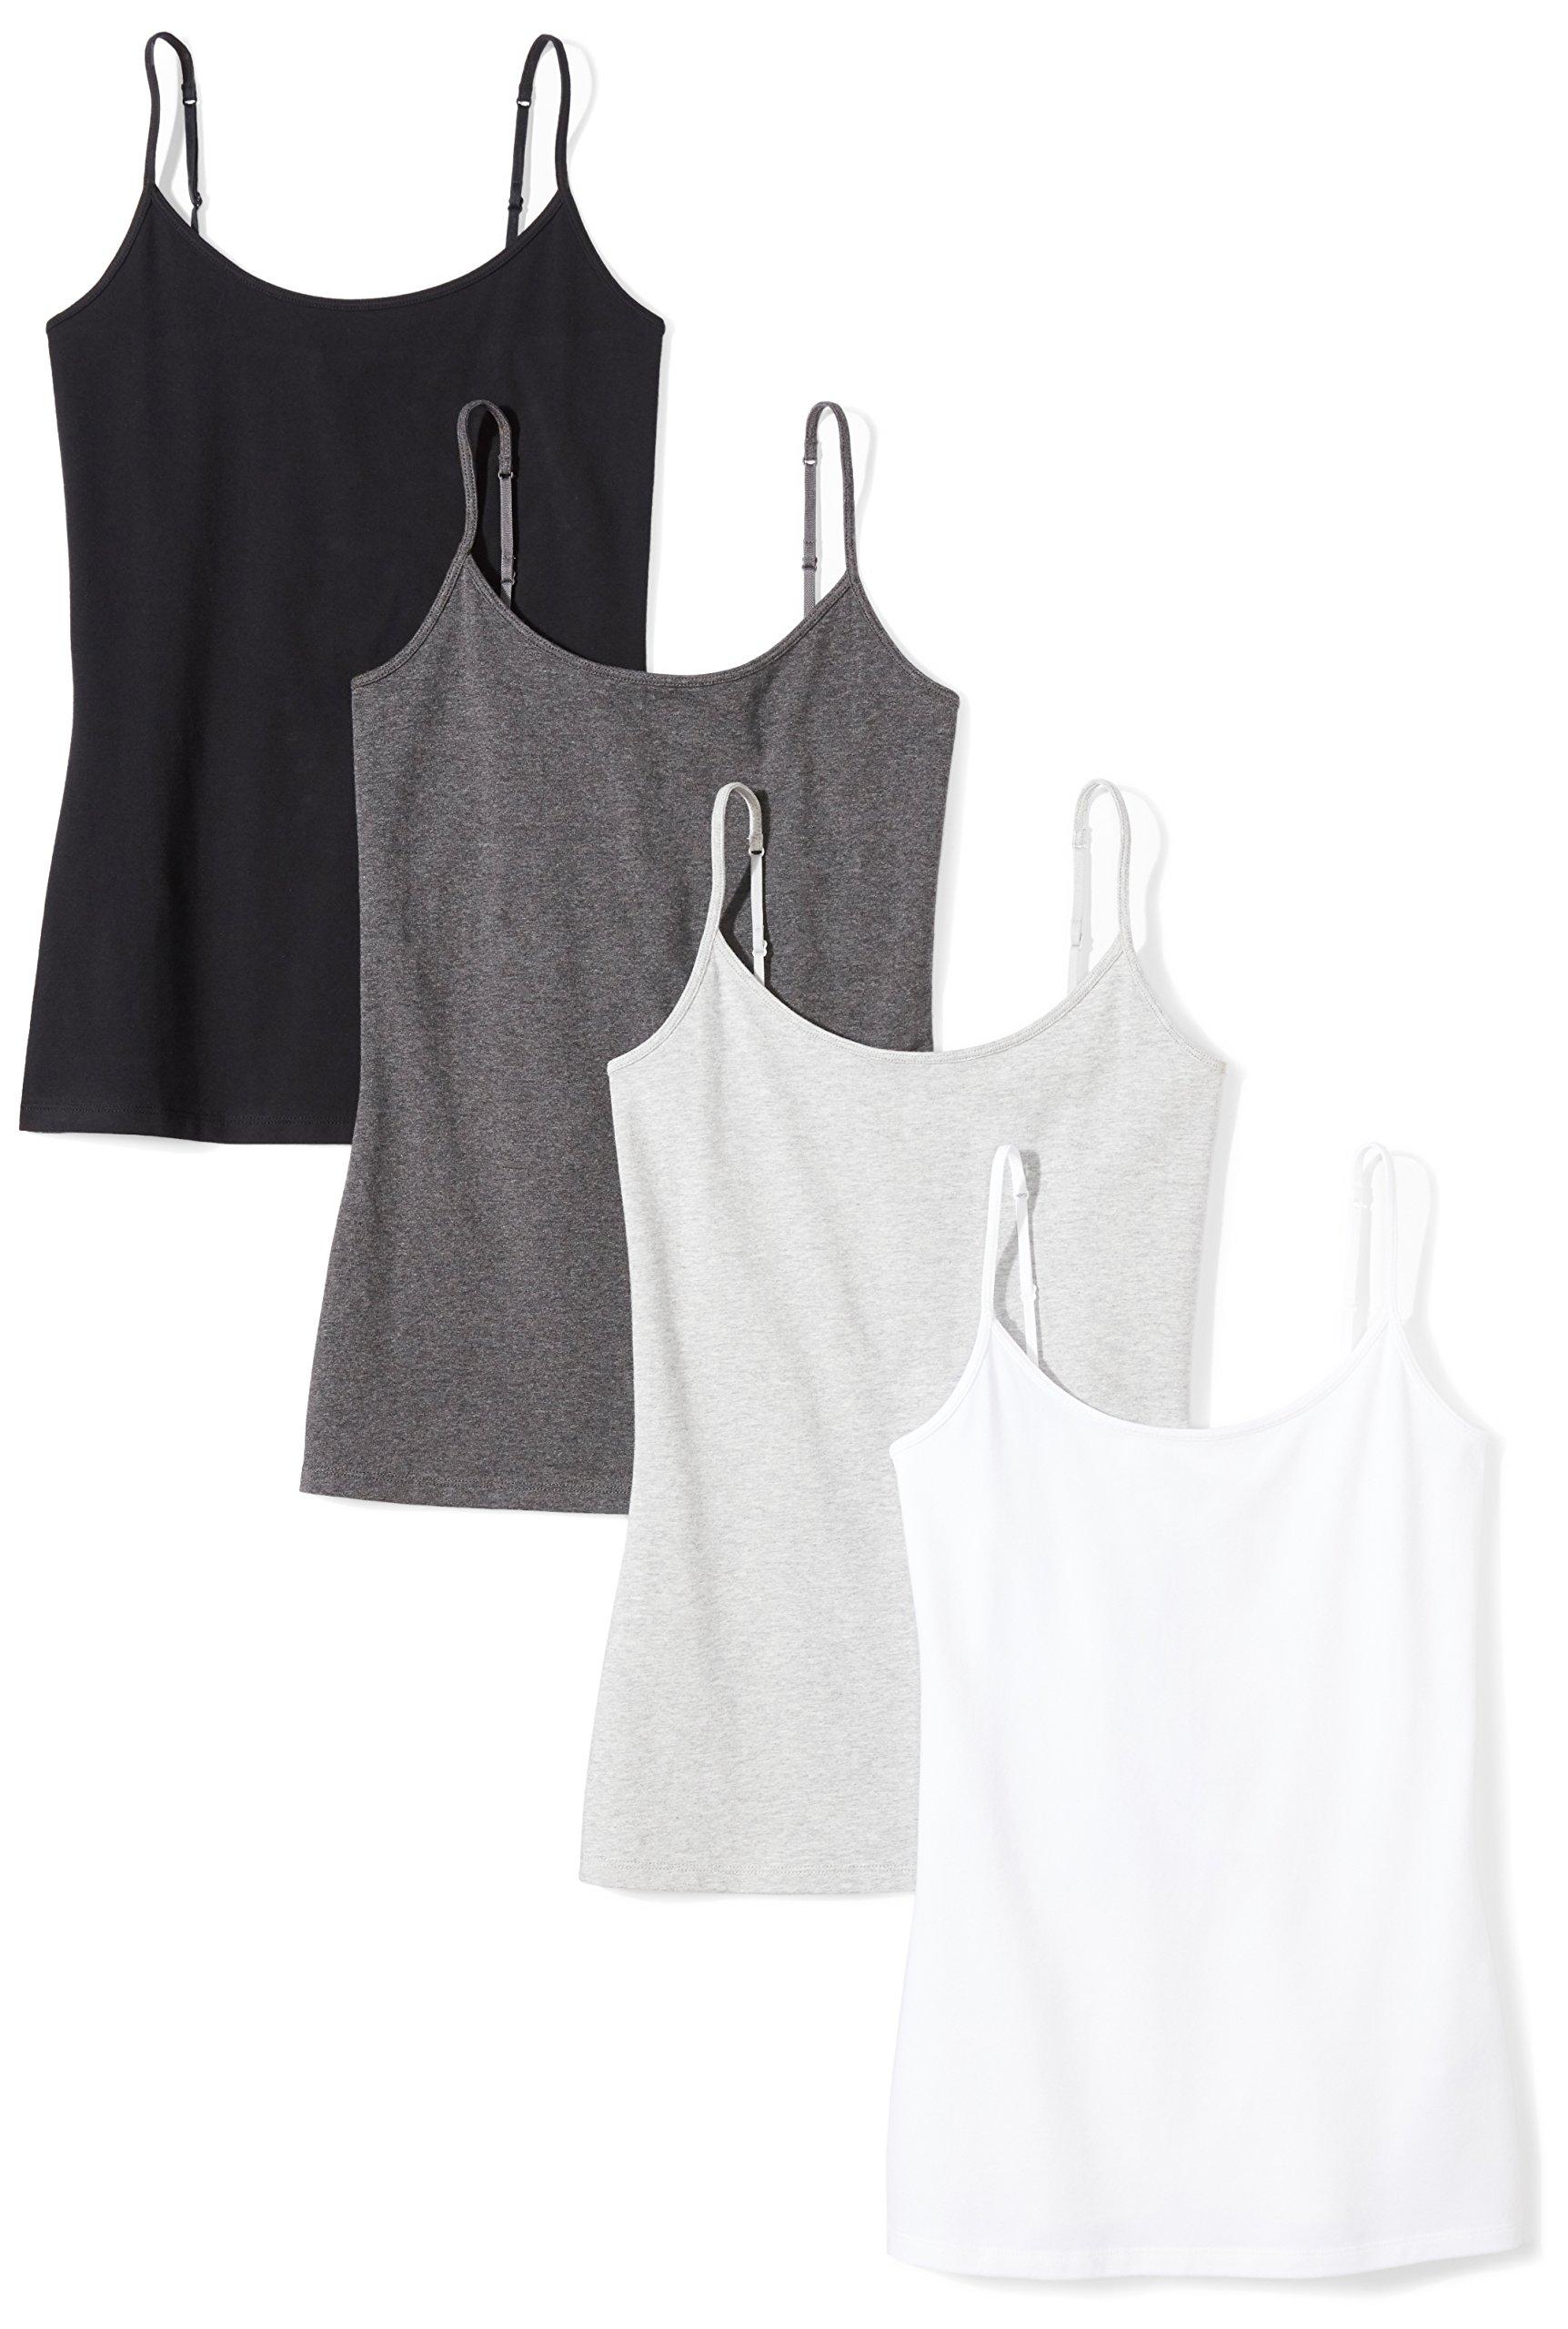 Amazon Essentials Women's 4-Pack Camisole, Black/White/Charcoal Heather/Light Grey Heather, Medium by Amazon Essentials